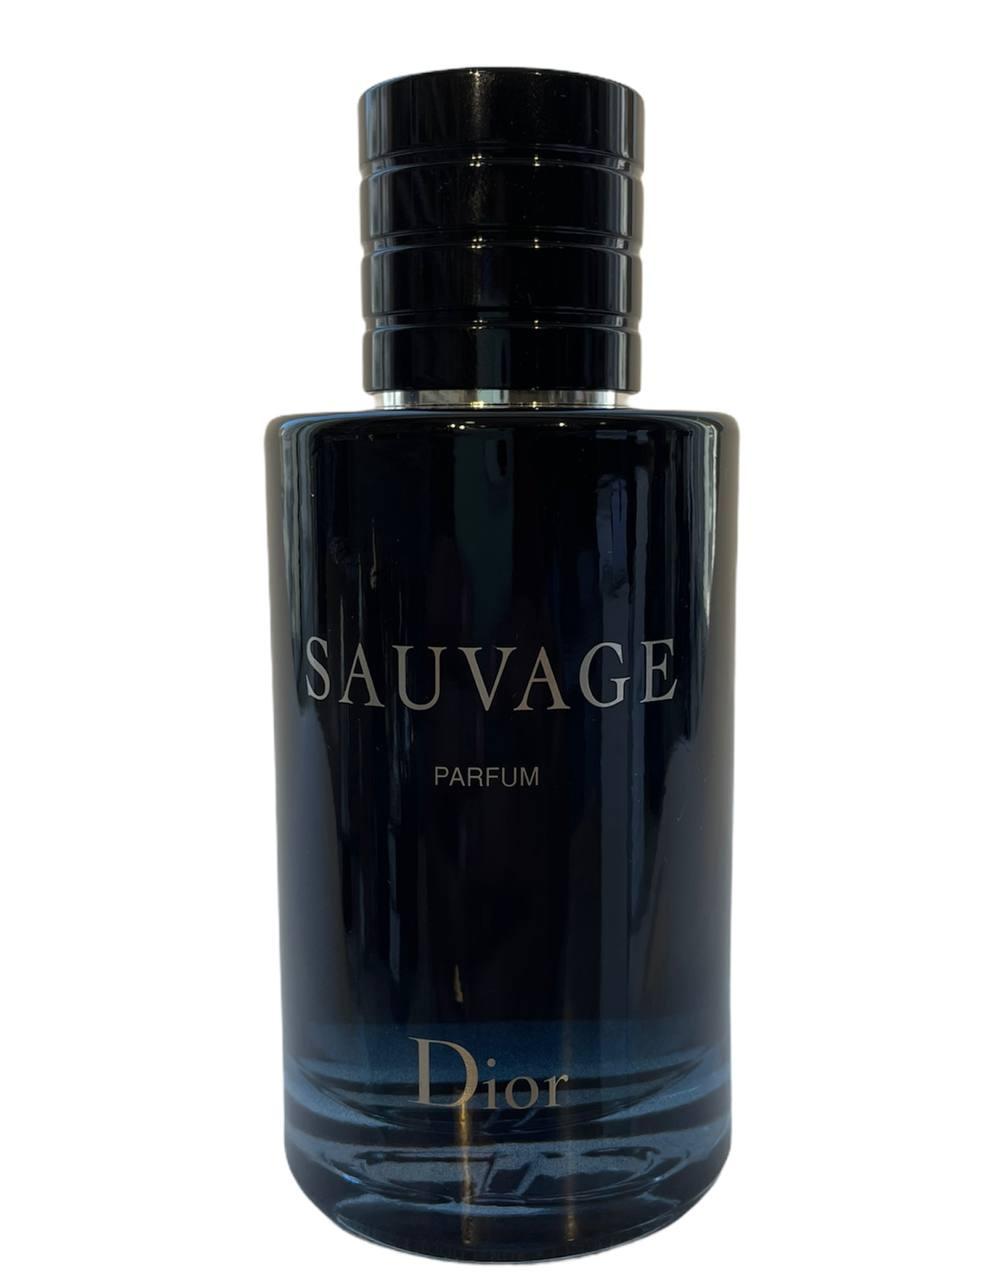 Sauvage Dior Parfum Tester 100 ml